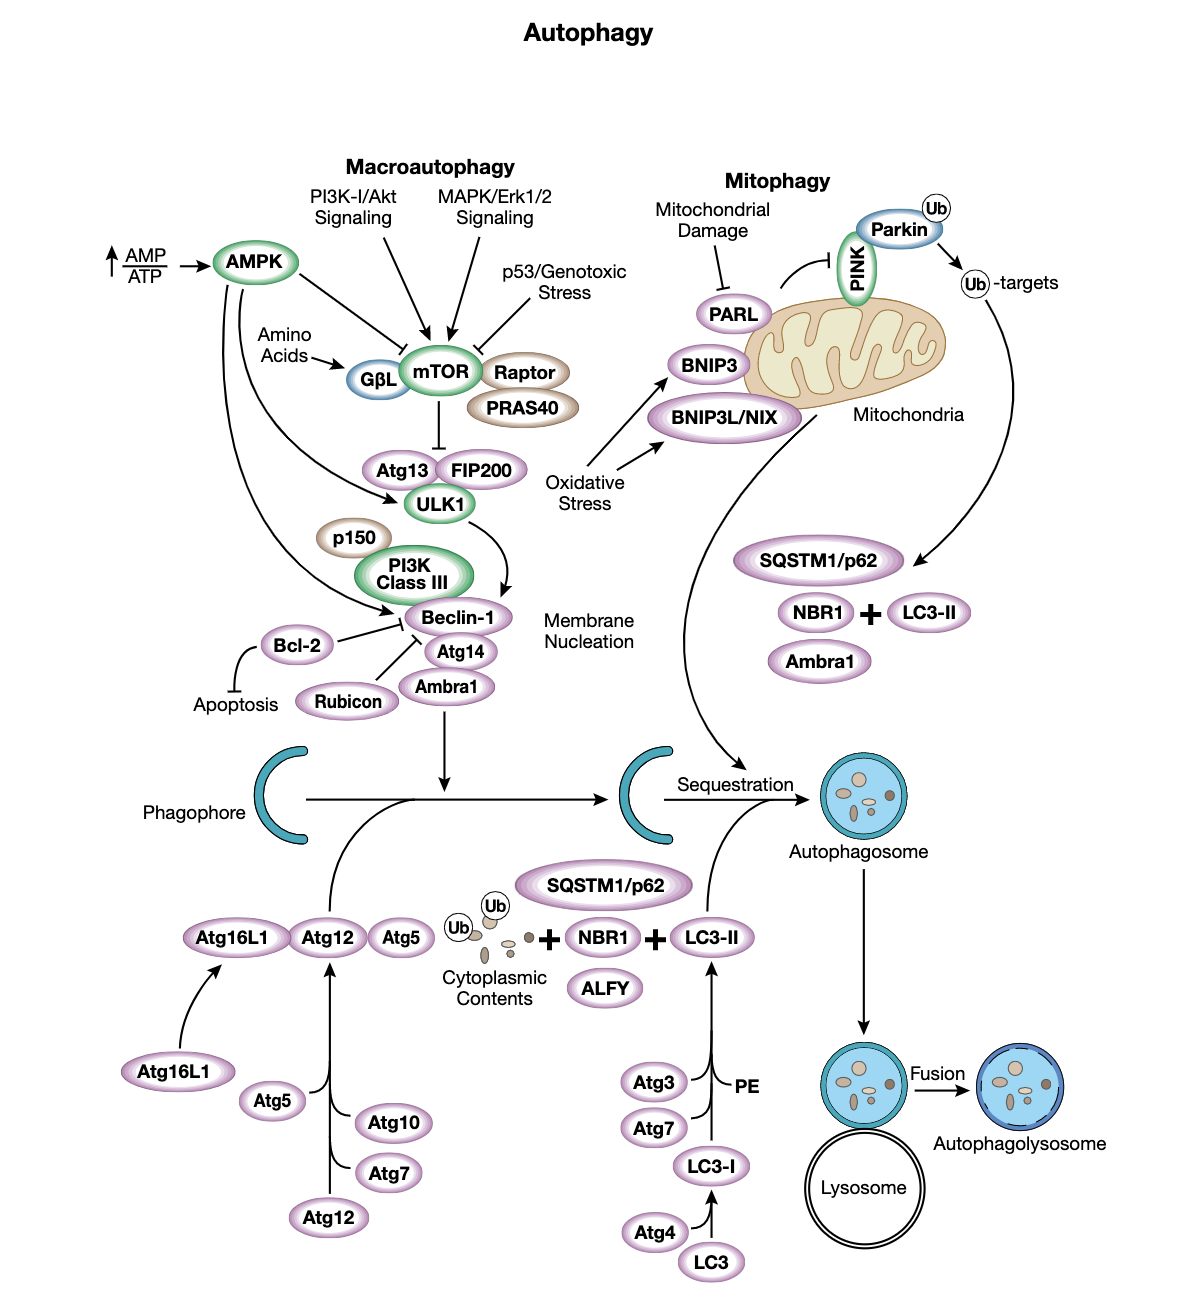 Figure 3 Autophagy Interactive Pathway